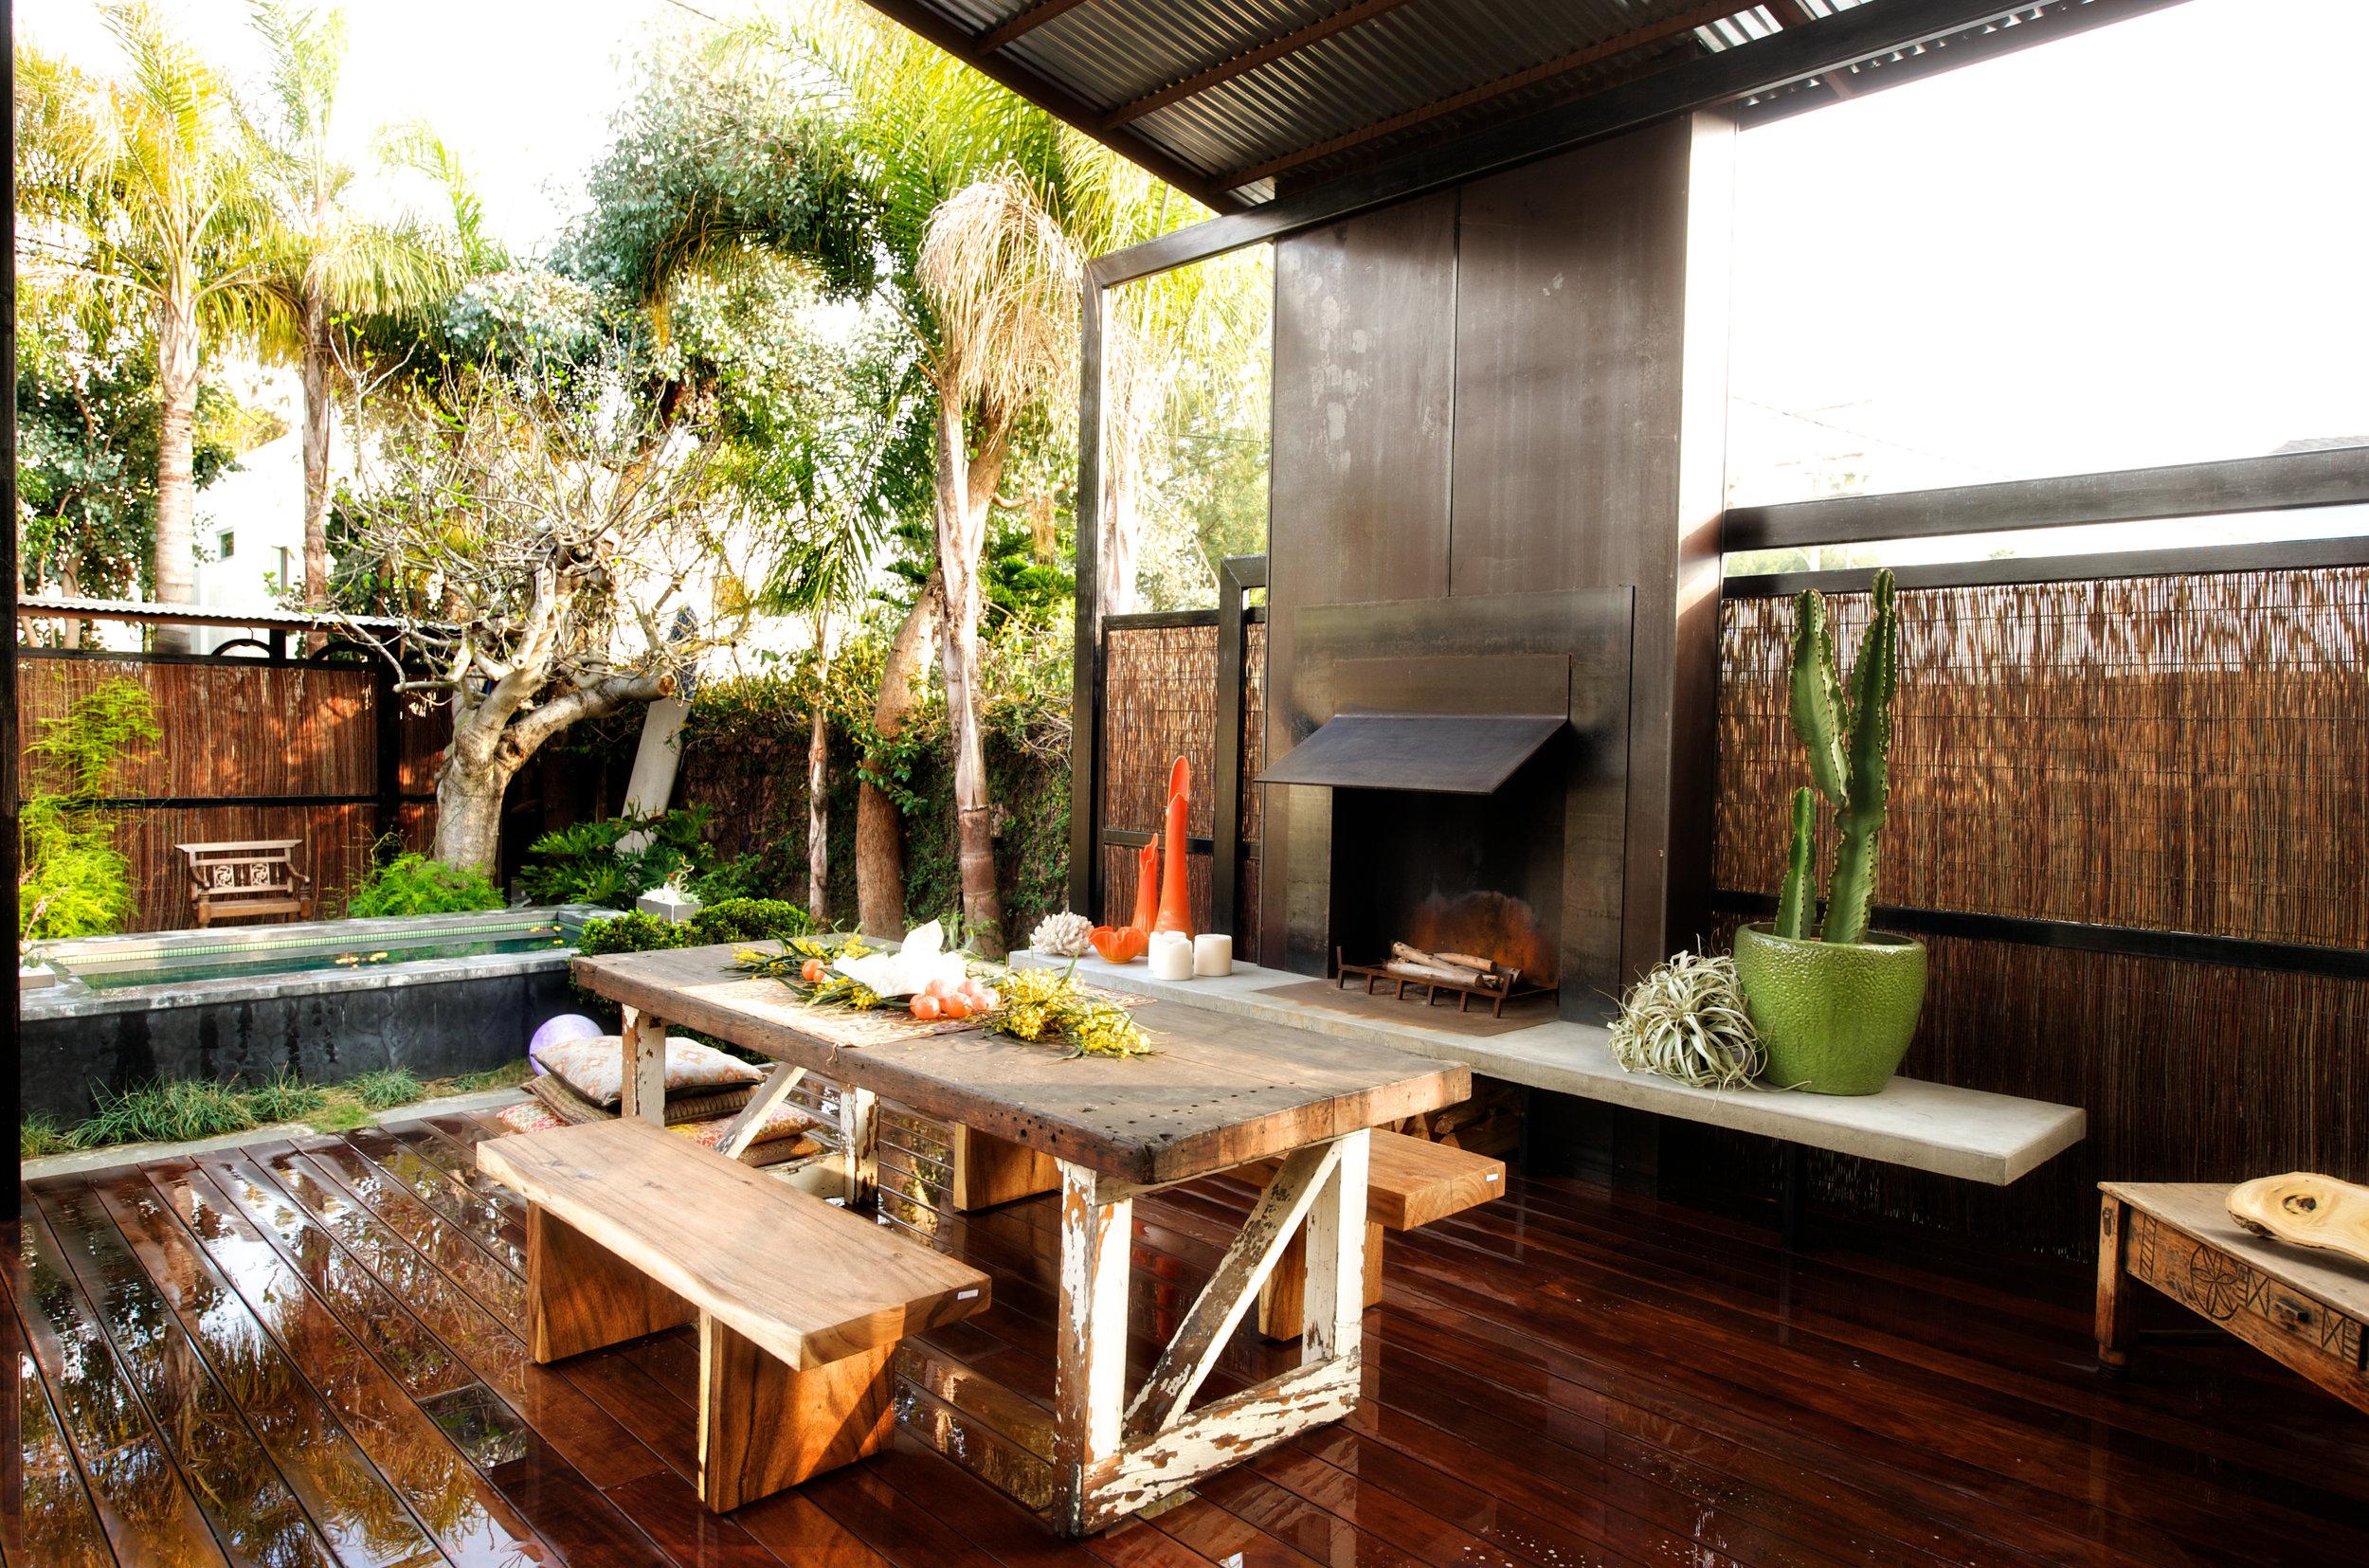 project-ozier-millwood-patio-fireplace.jpg